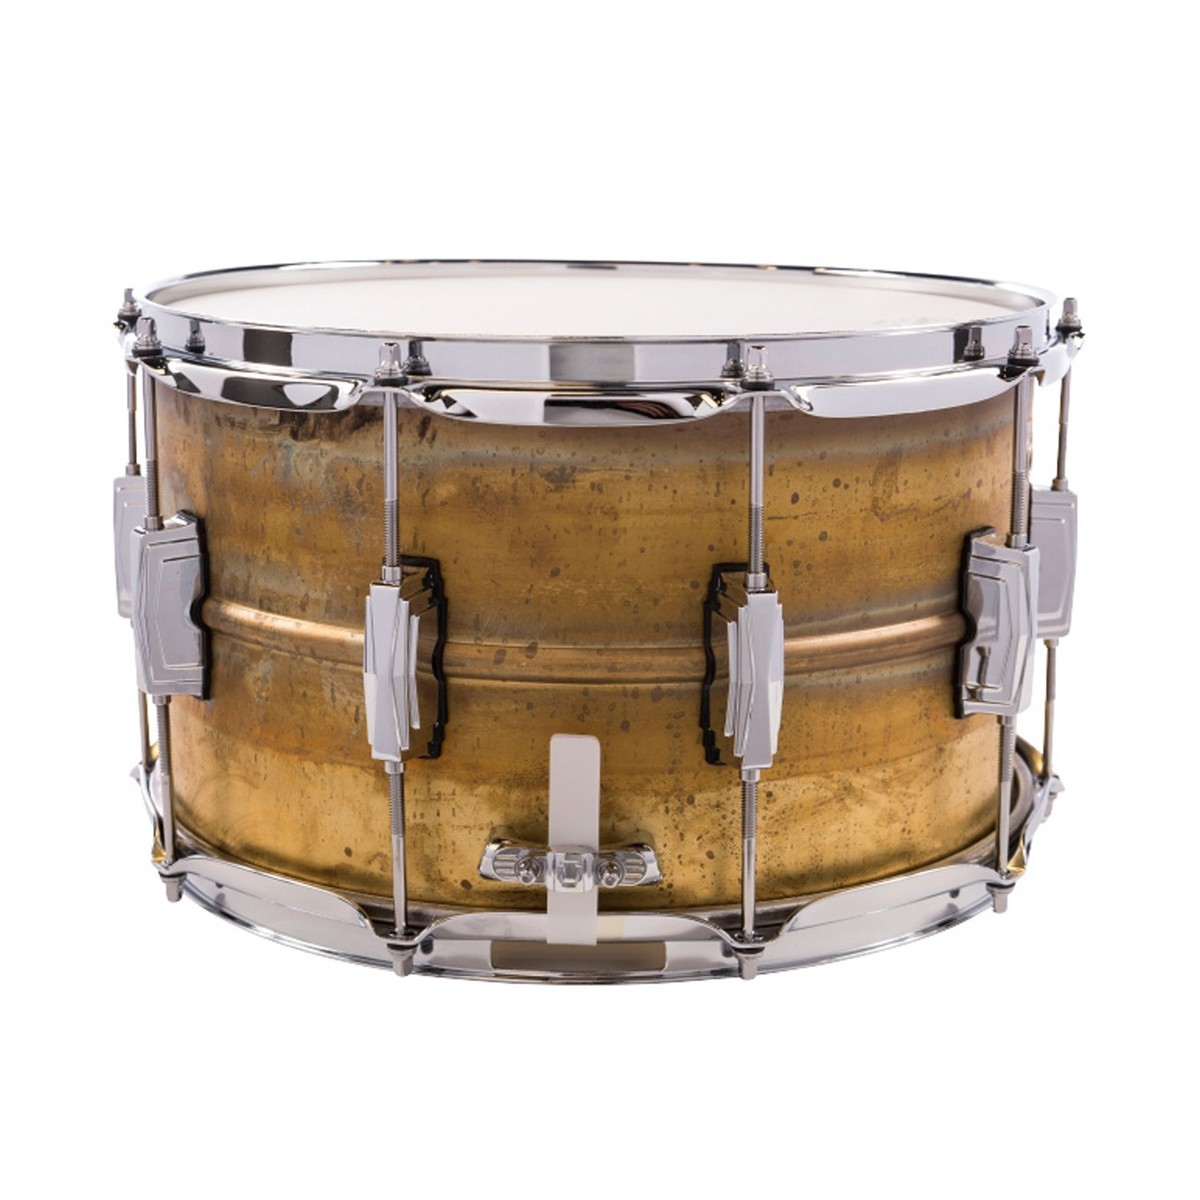 Ludwig 14\'\' x 8\'\' Raw Brass Snare Drum bei Gear4music